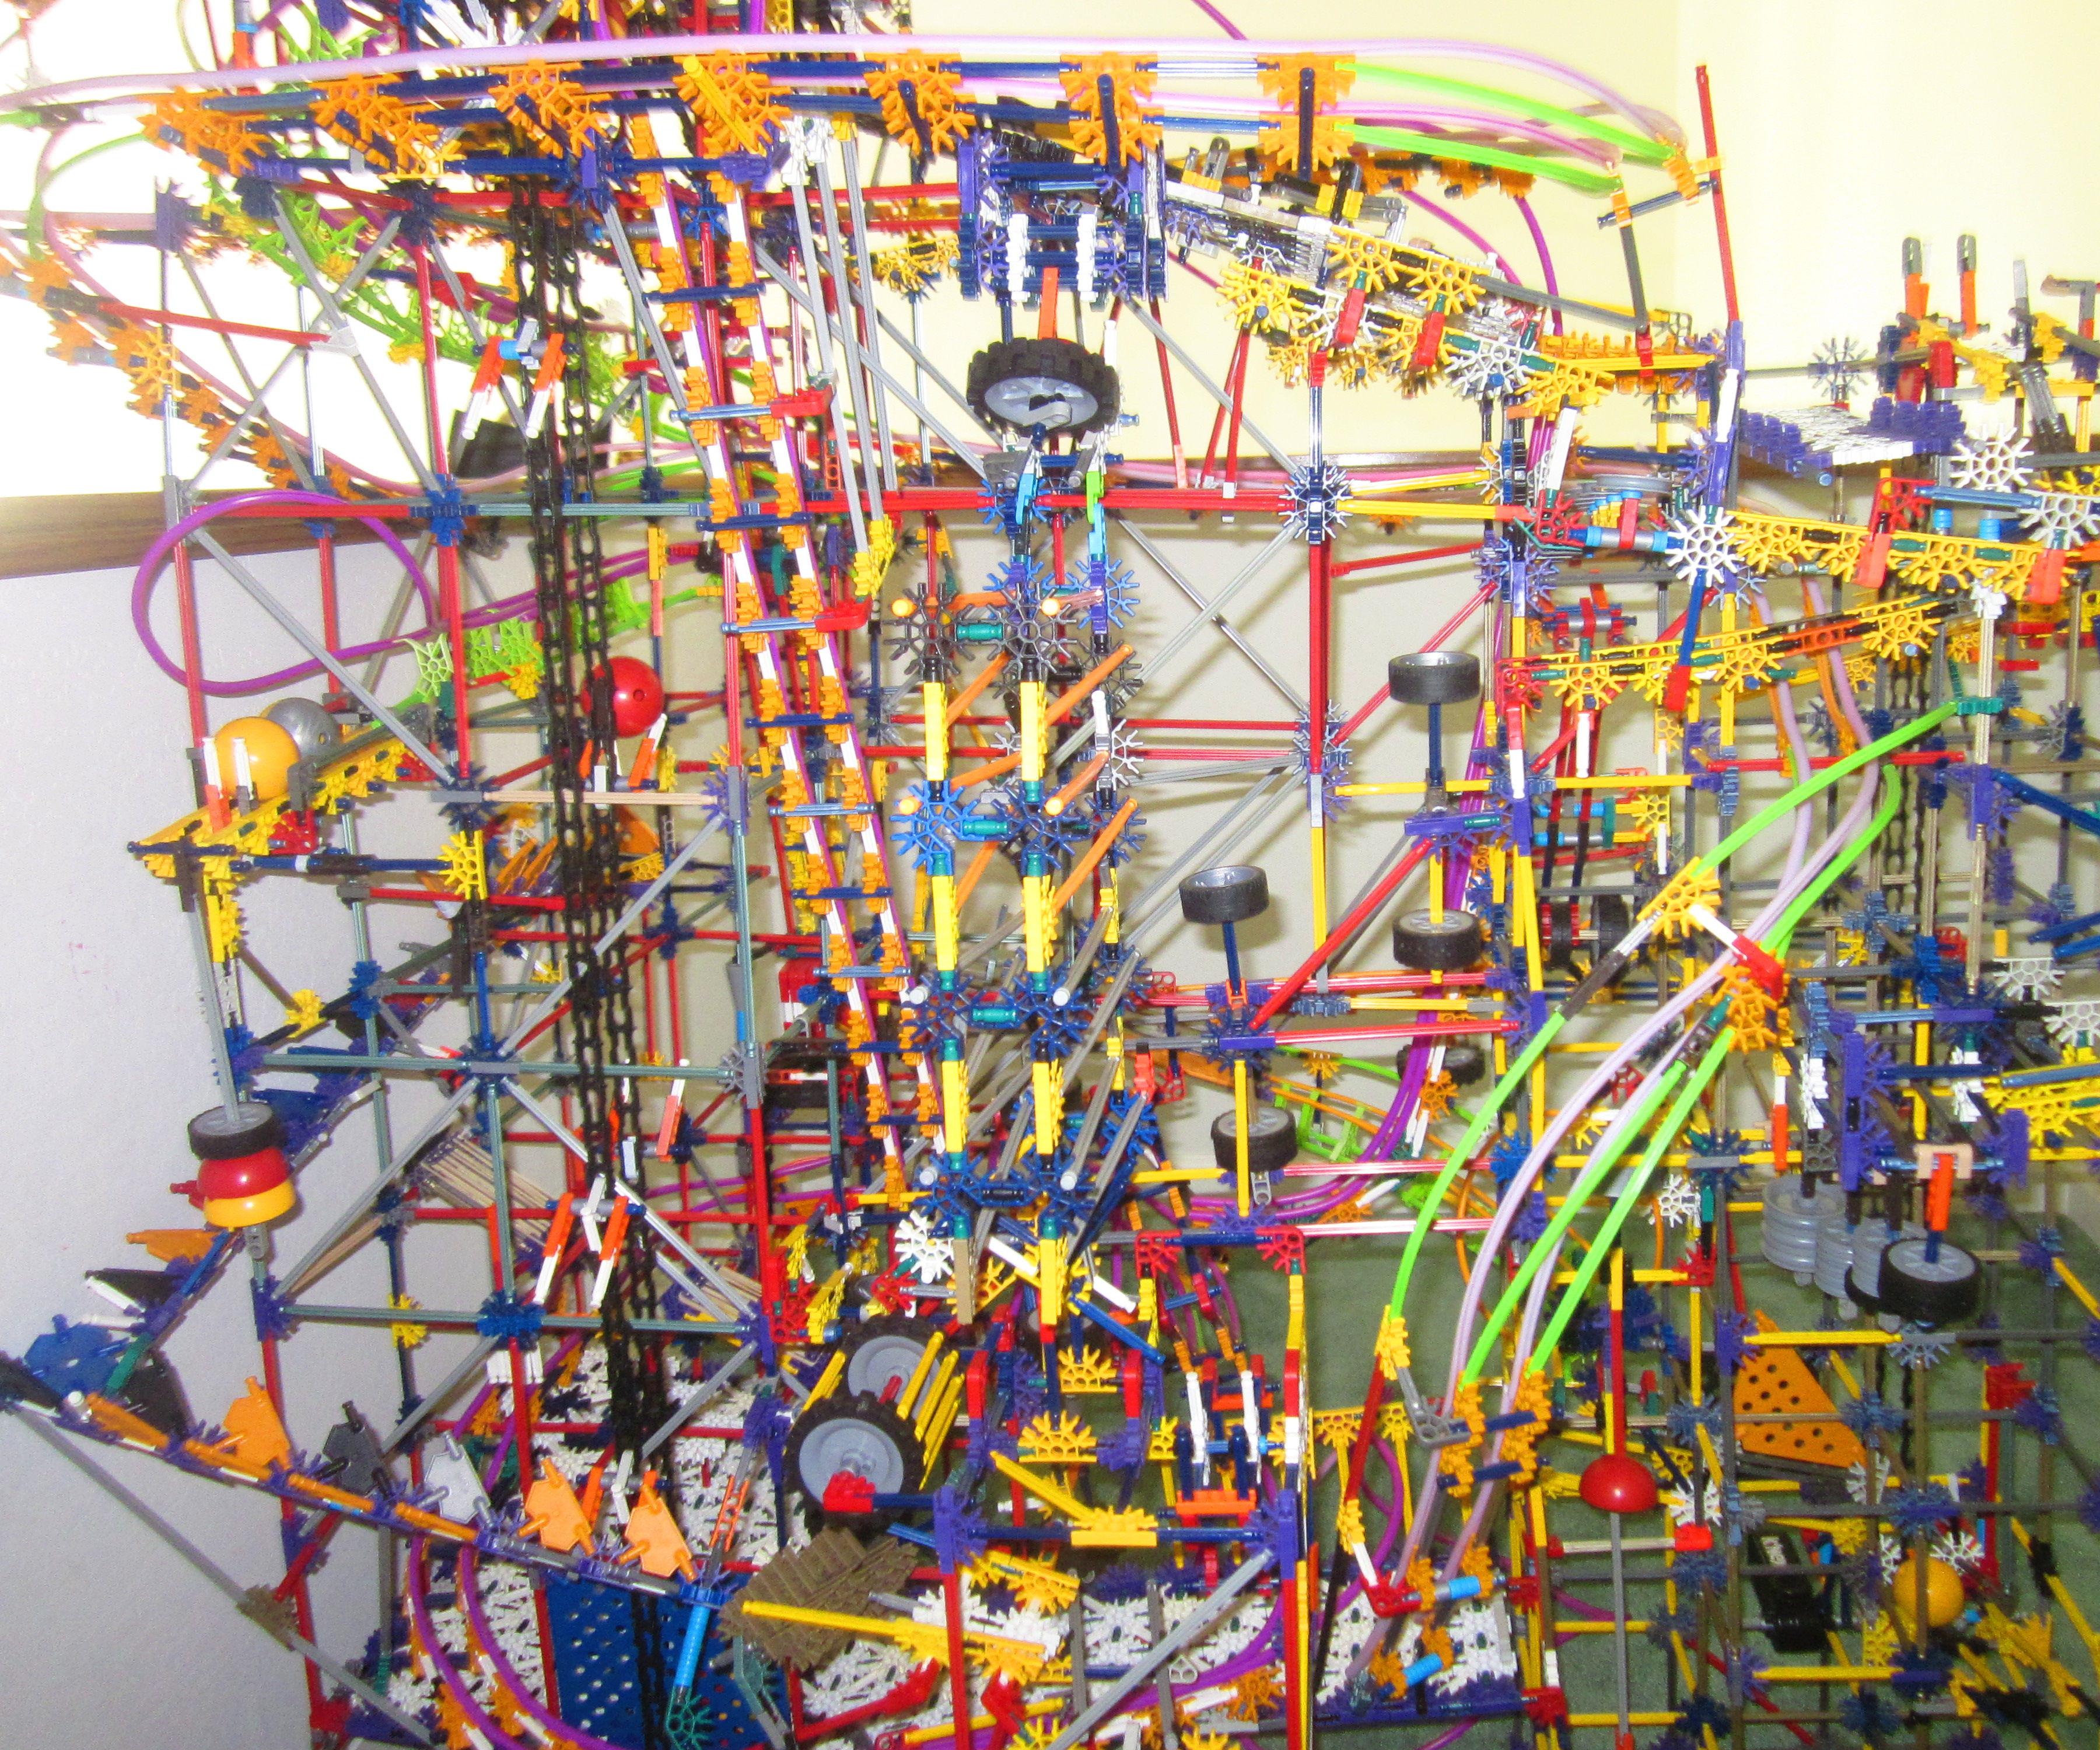 K'nex ball machine the element new elements